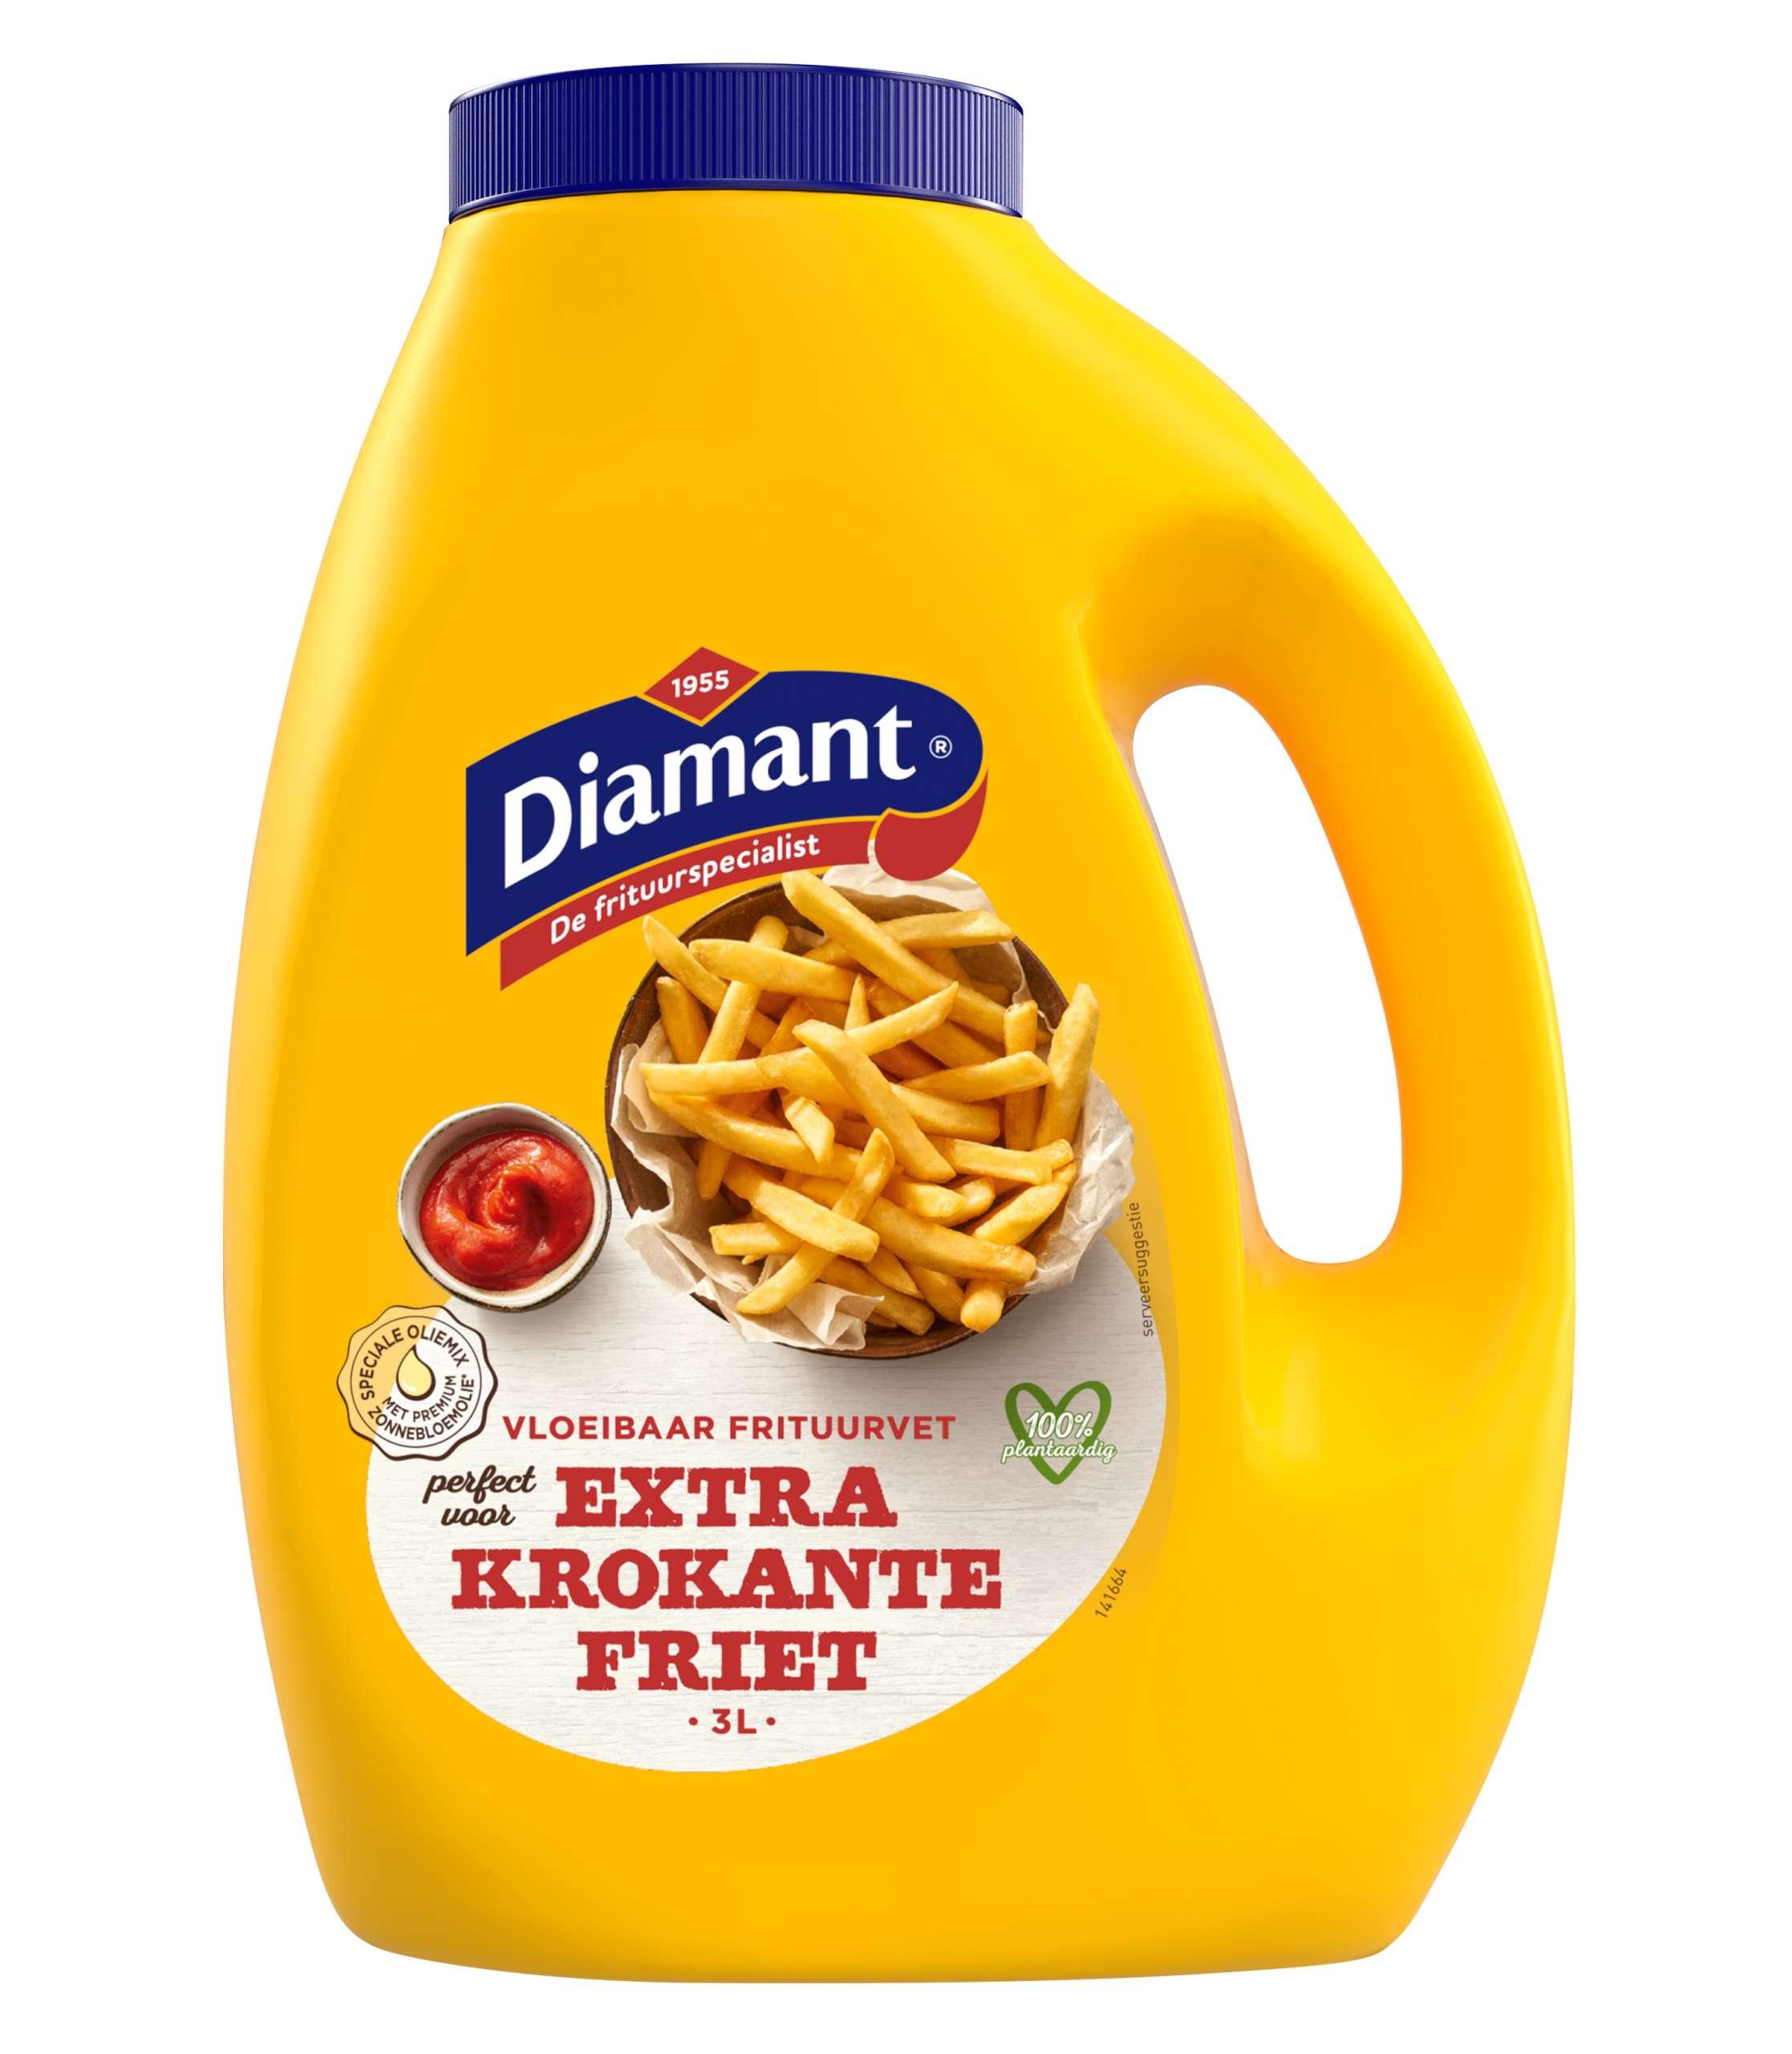 Vloeibaar frituurvet extra krokante friet 3L